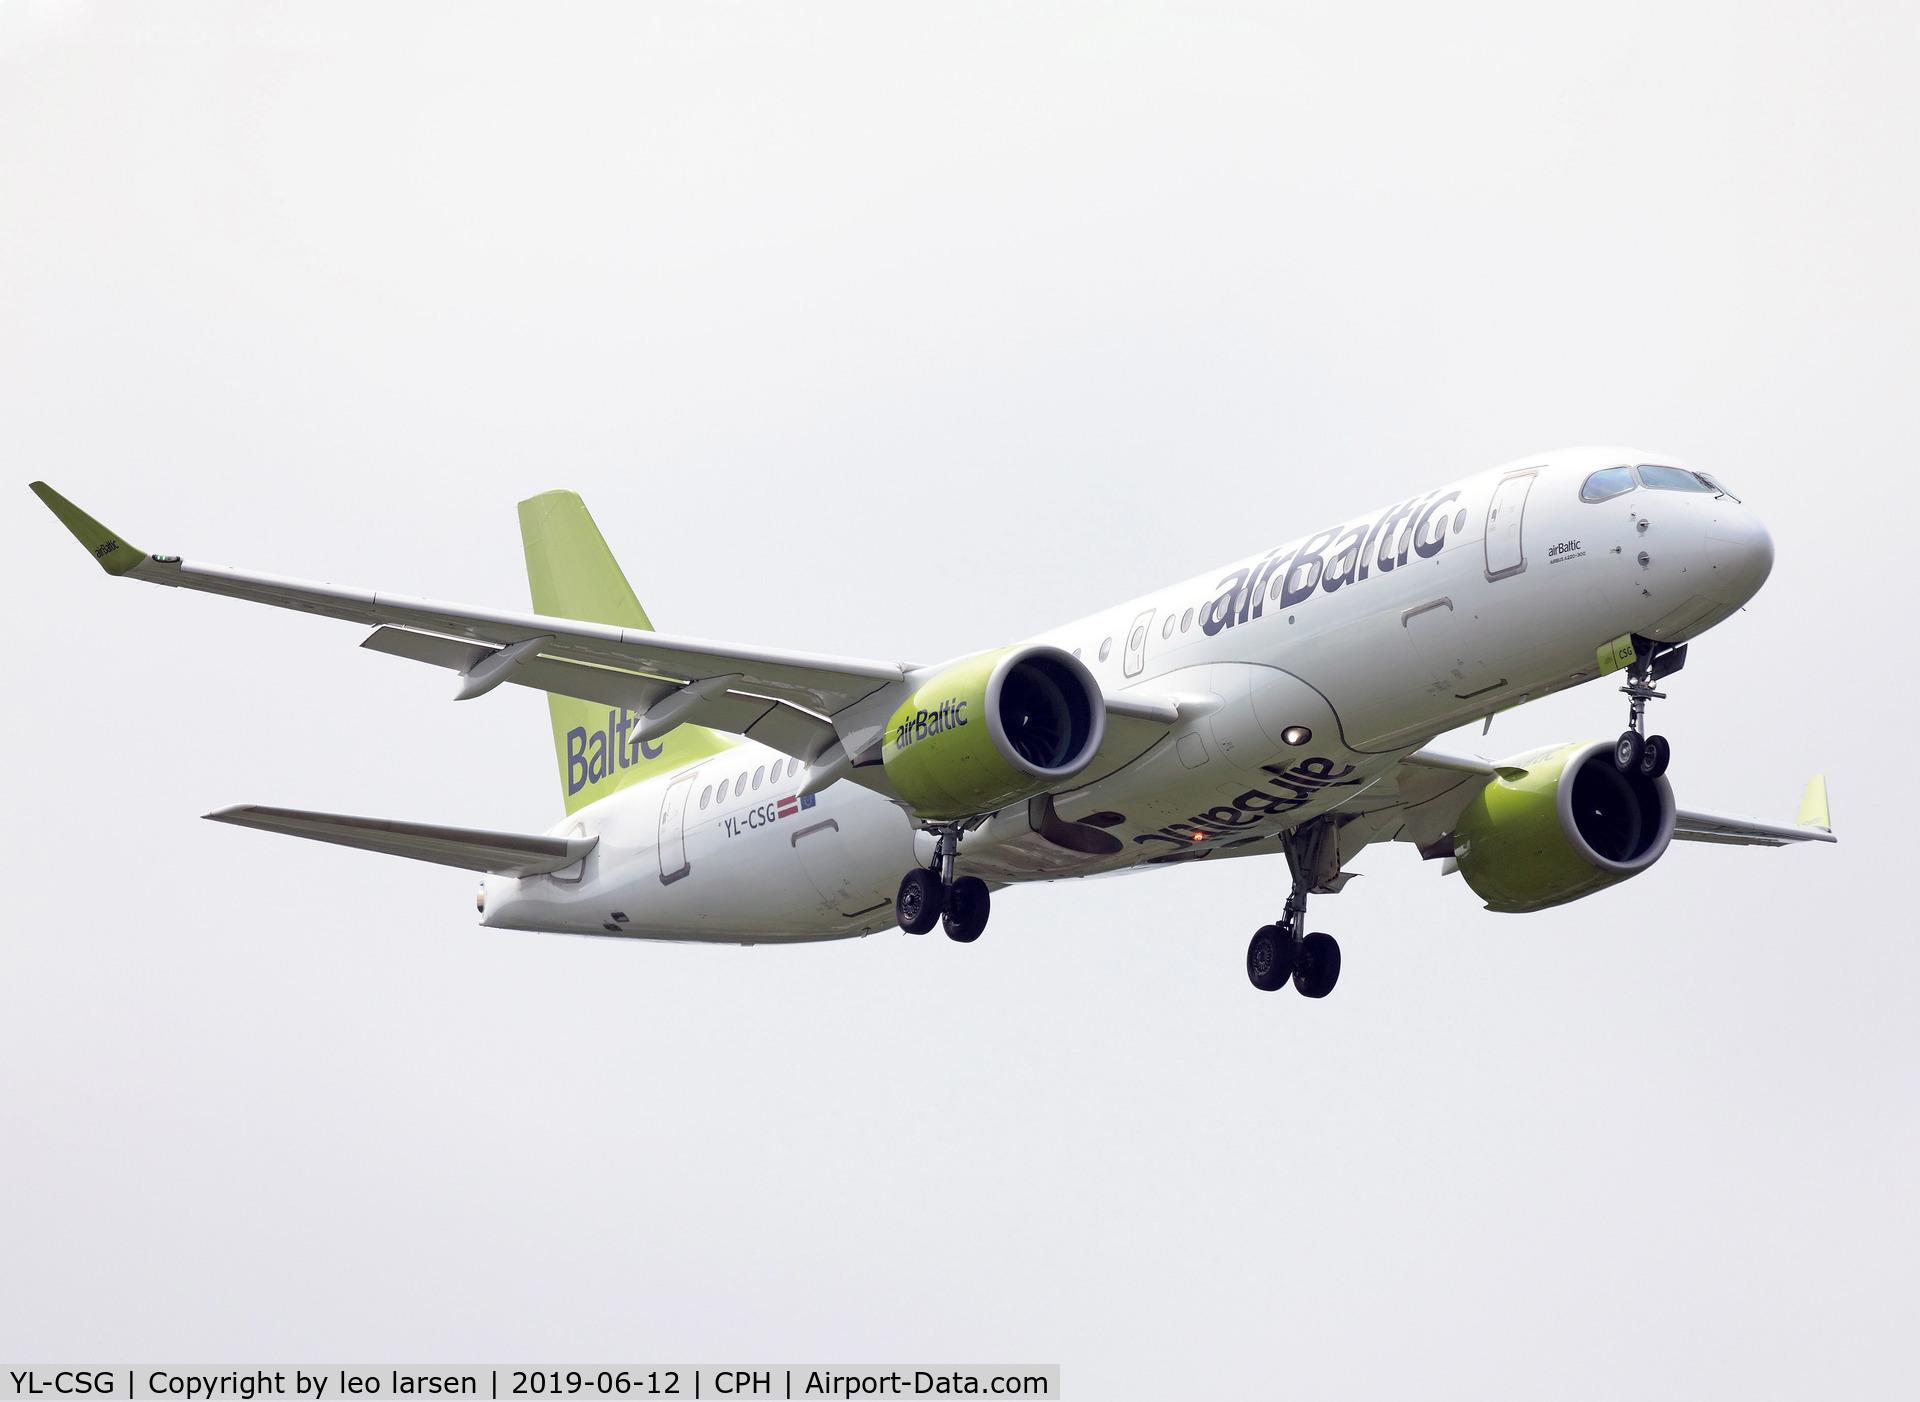 YL-CSG, 2017 Bombardier CSeries CS300 (BD-500-1A11) C/N 55009, Copenhagen 12.6.2019